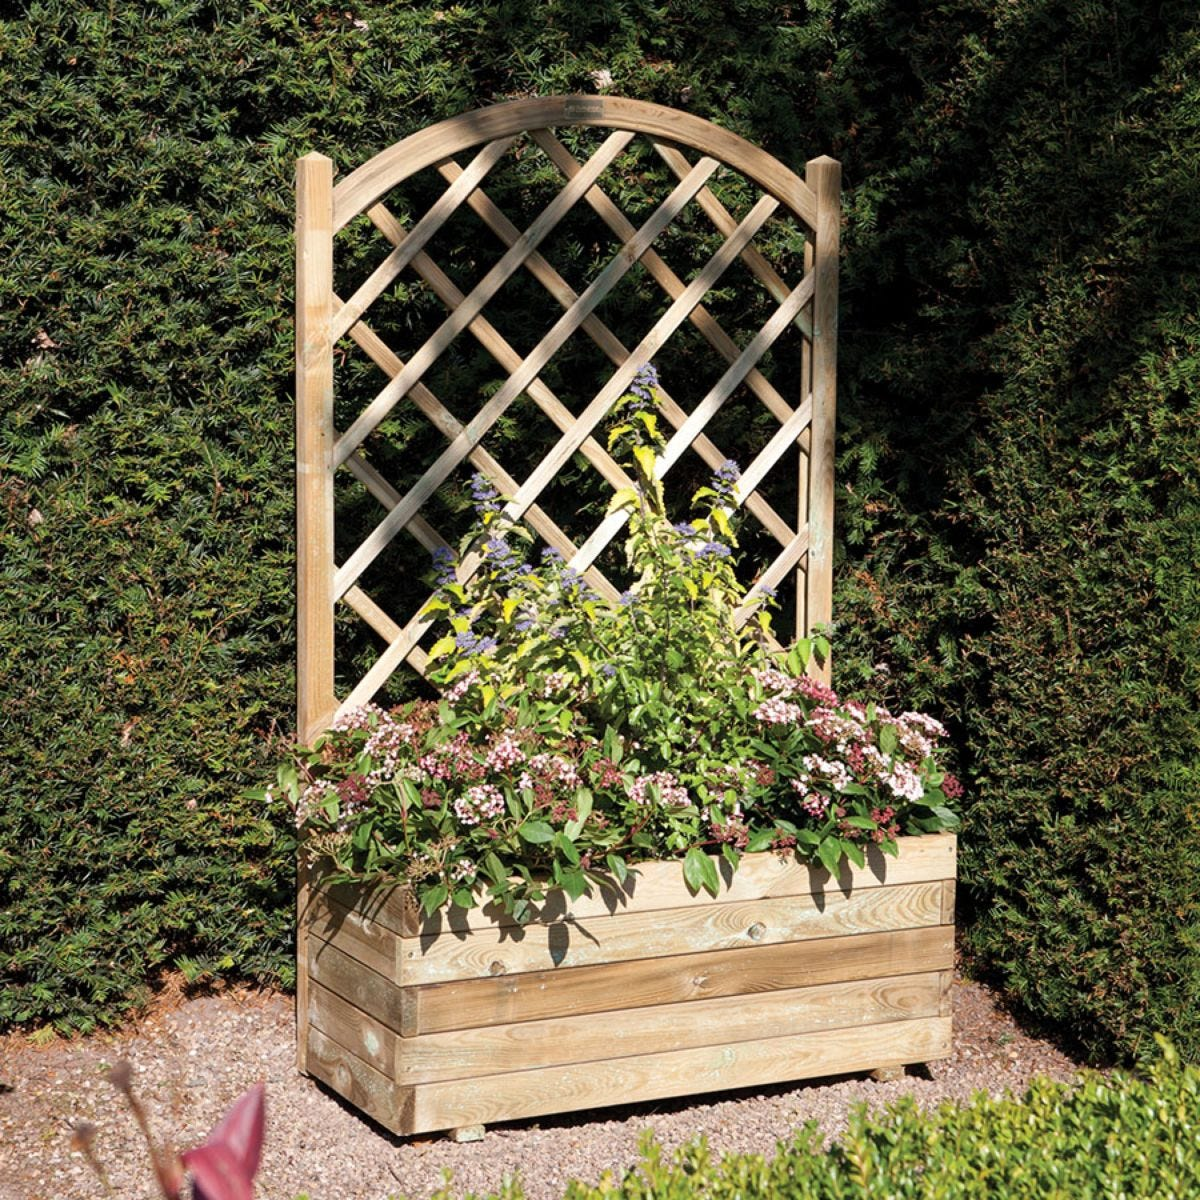 Rowlinson Rectangular Garden Planter with Lattice